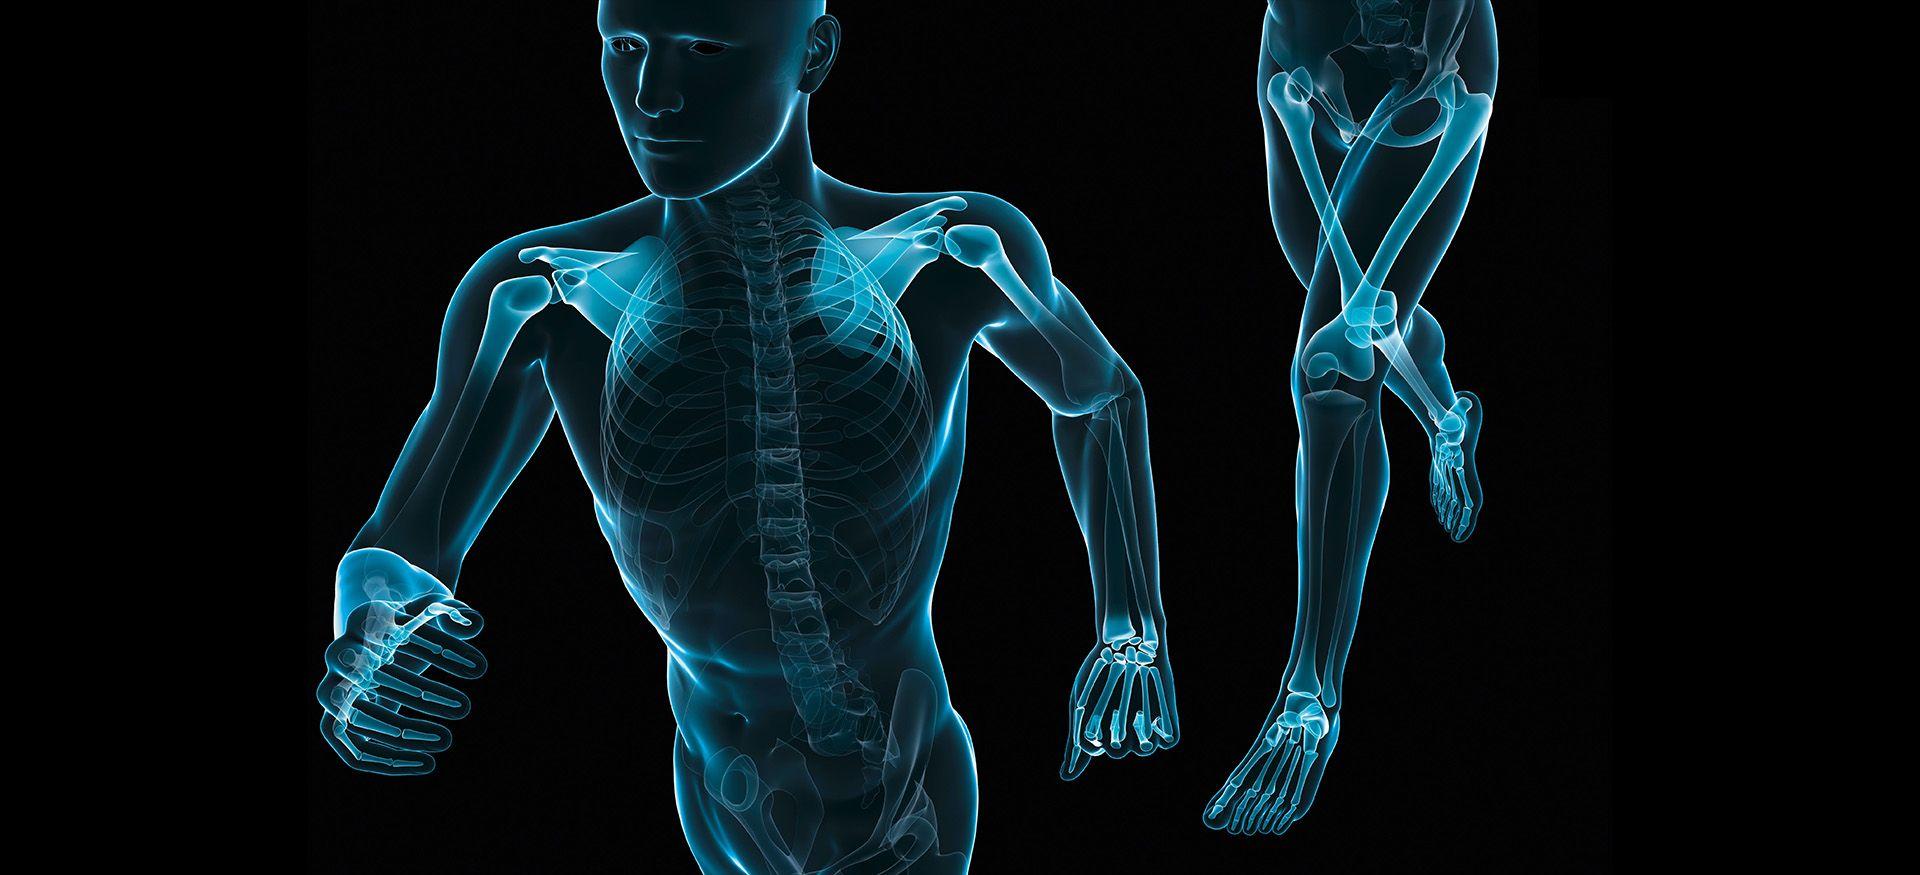 Implantate und Implantatsysteme Traumatologie